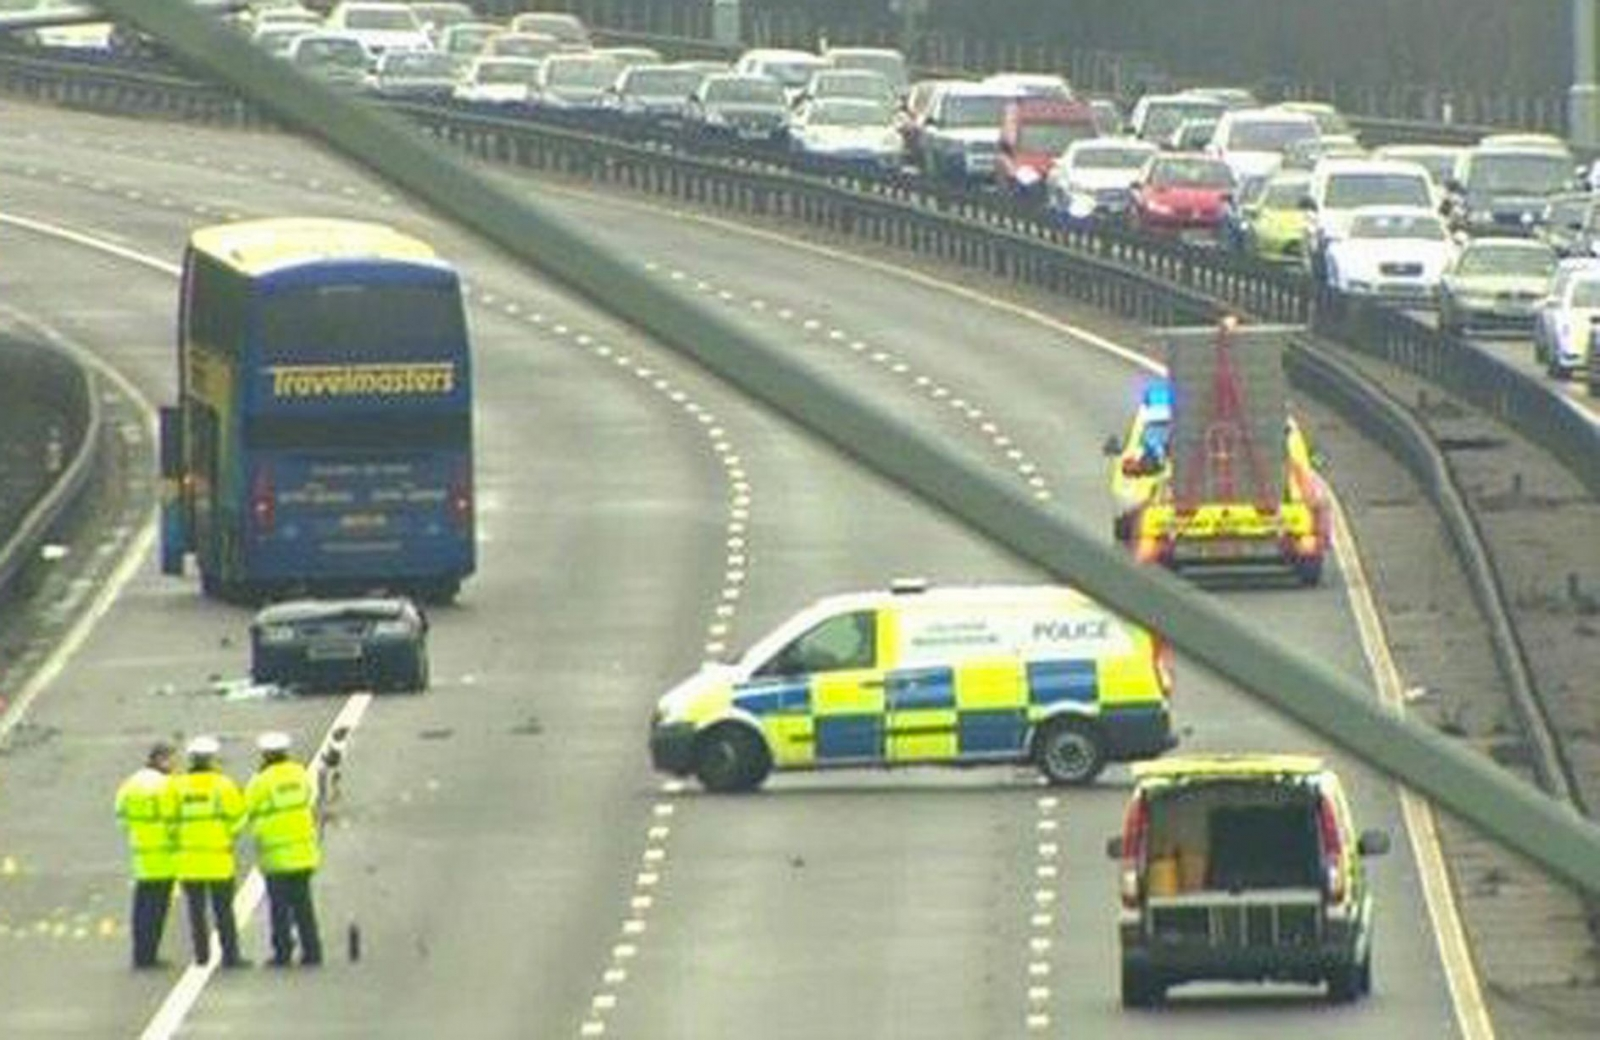 The scene of today's crash, in which three men were killed. (BBC)